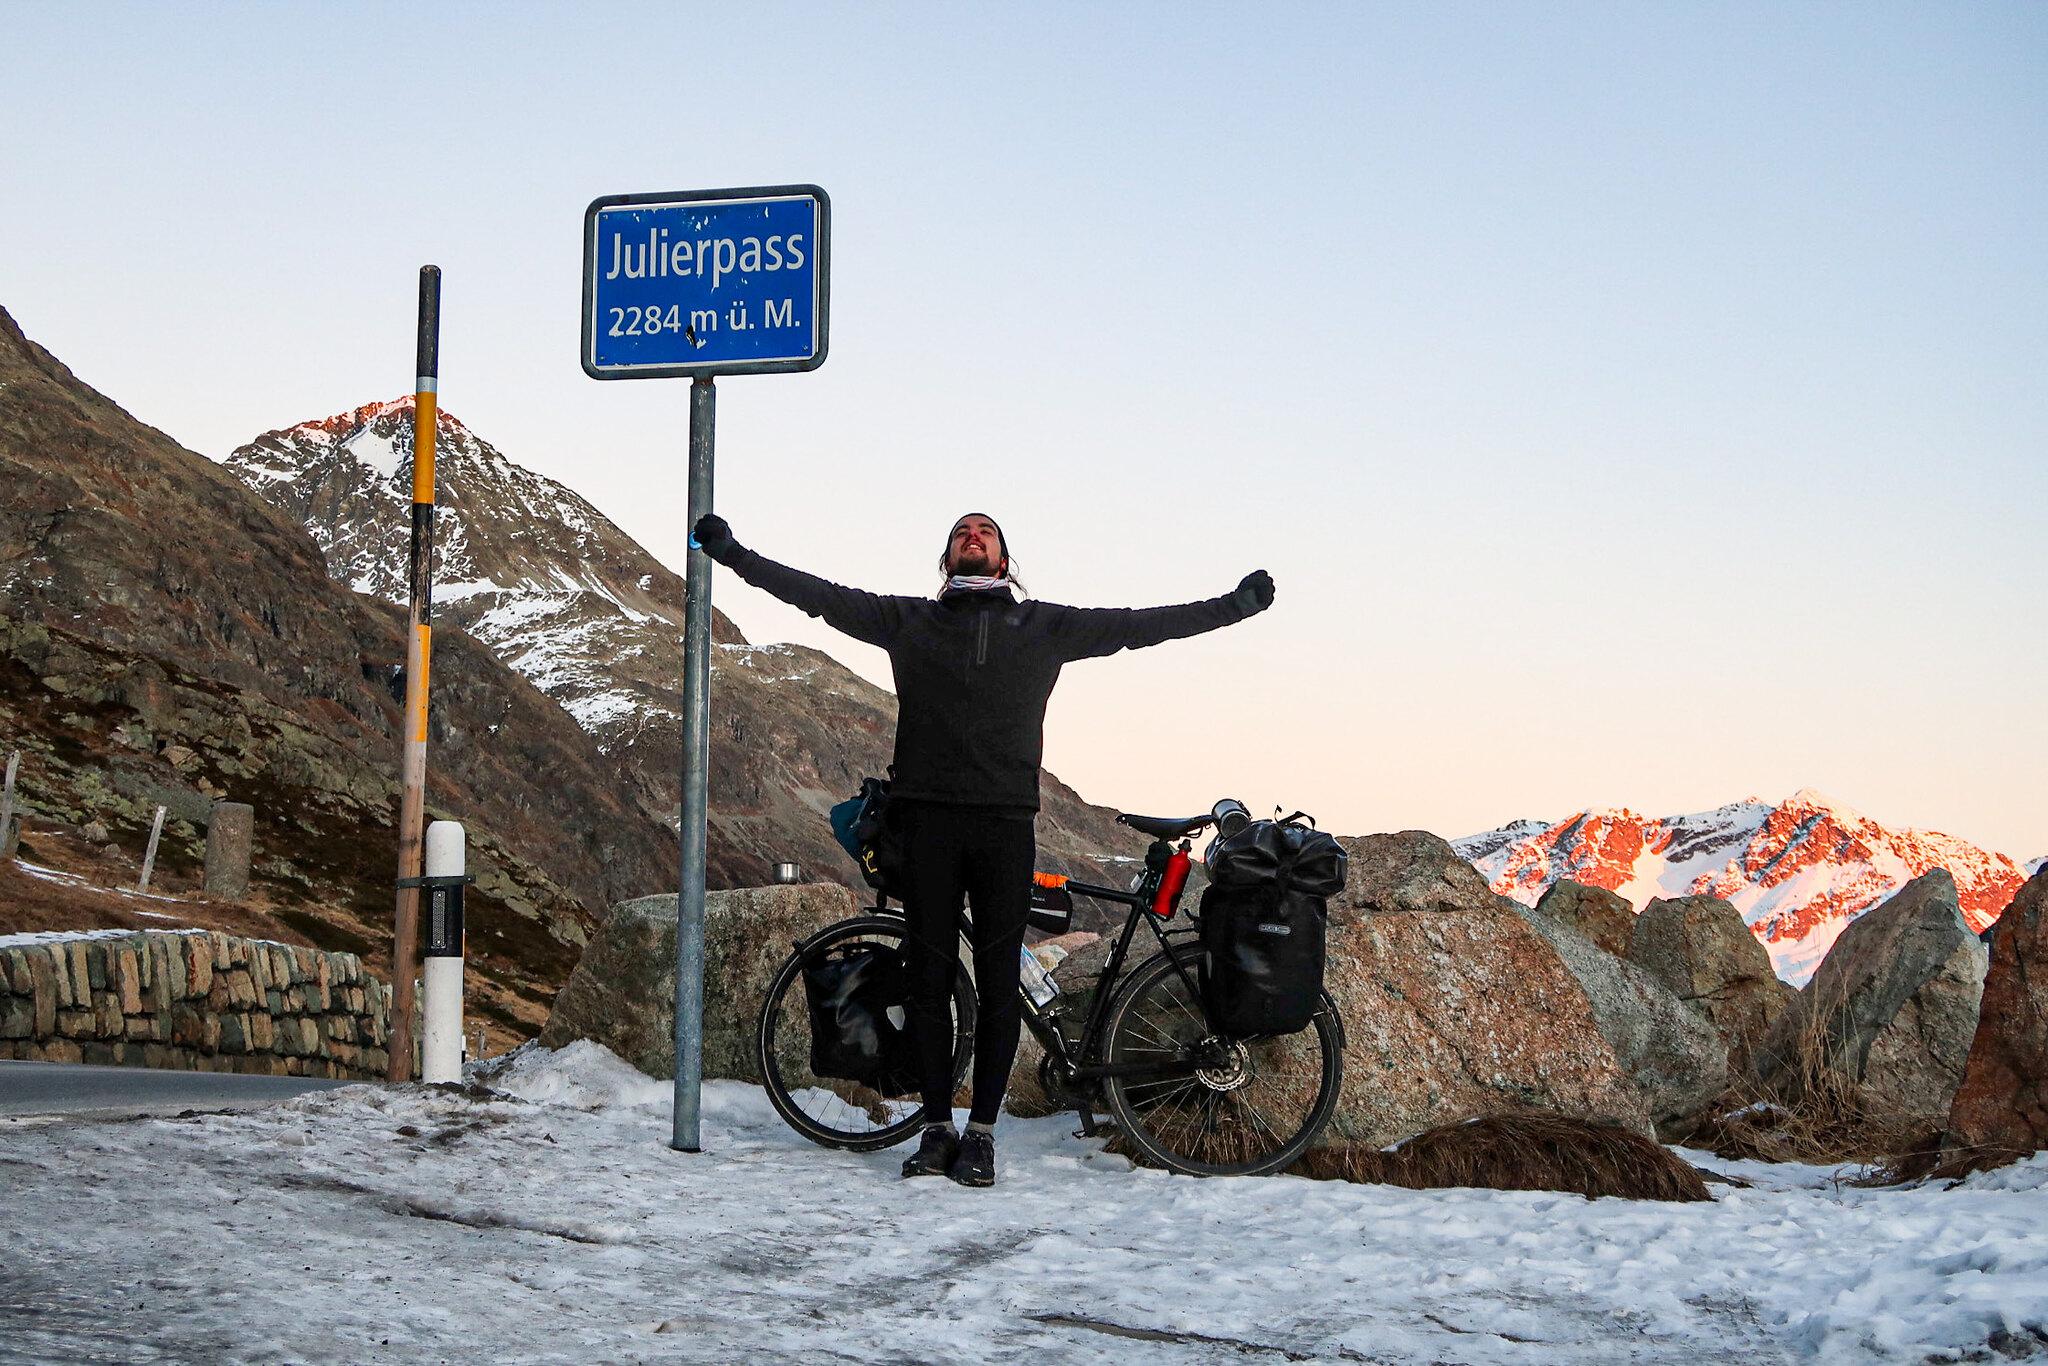 Crossing Julierpass Switzerland